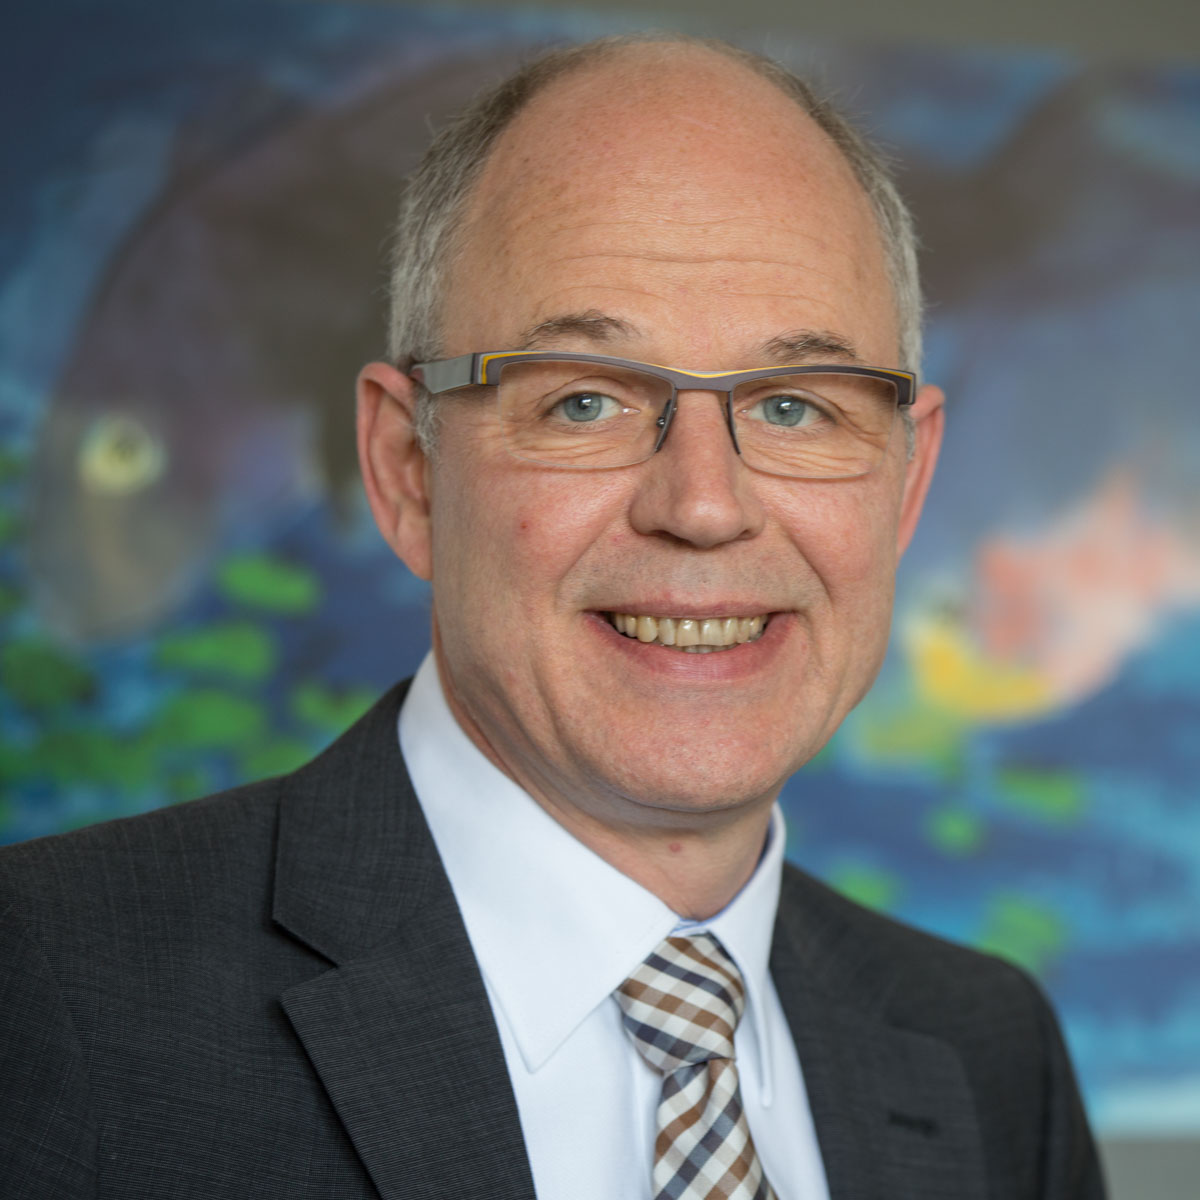 Elmar Weber - Fachanwalt für Arbeitsrecht